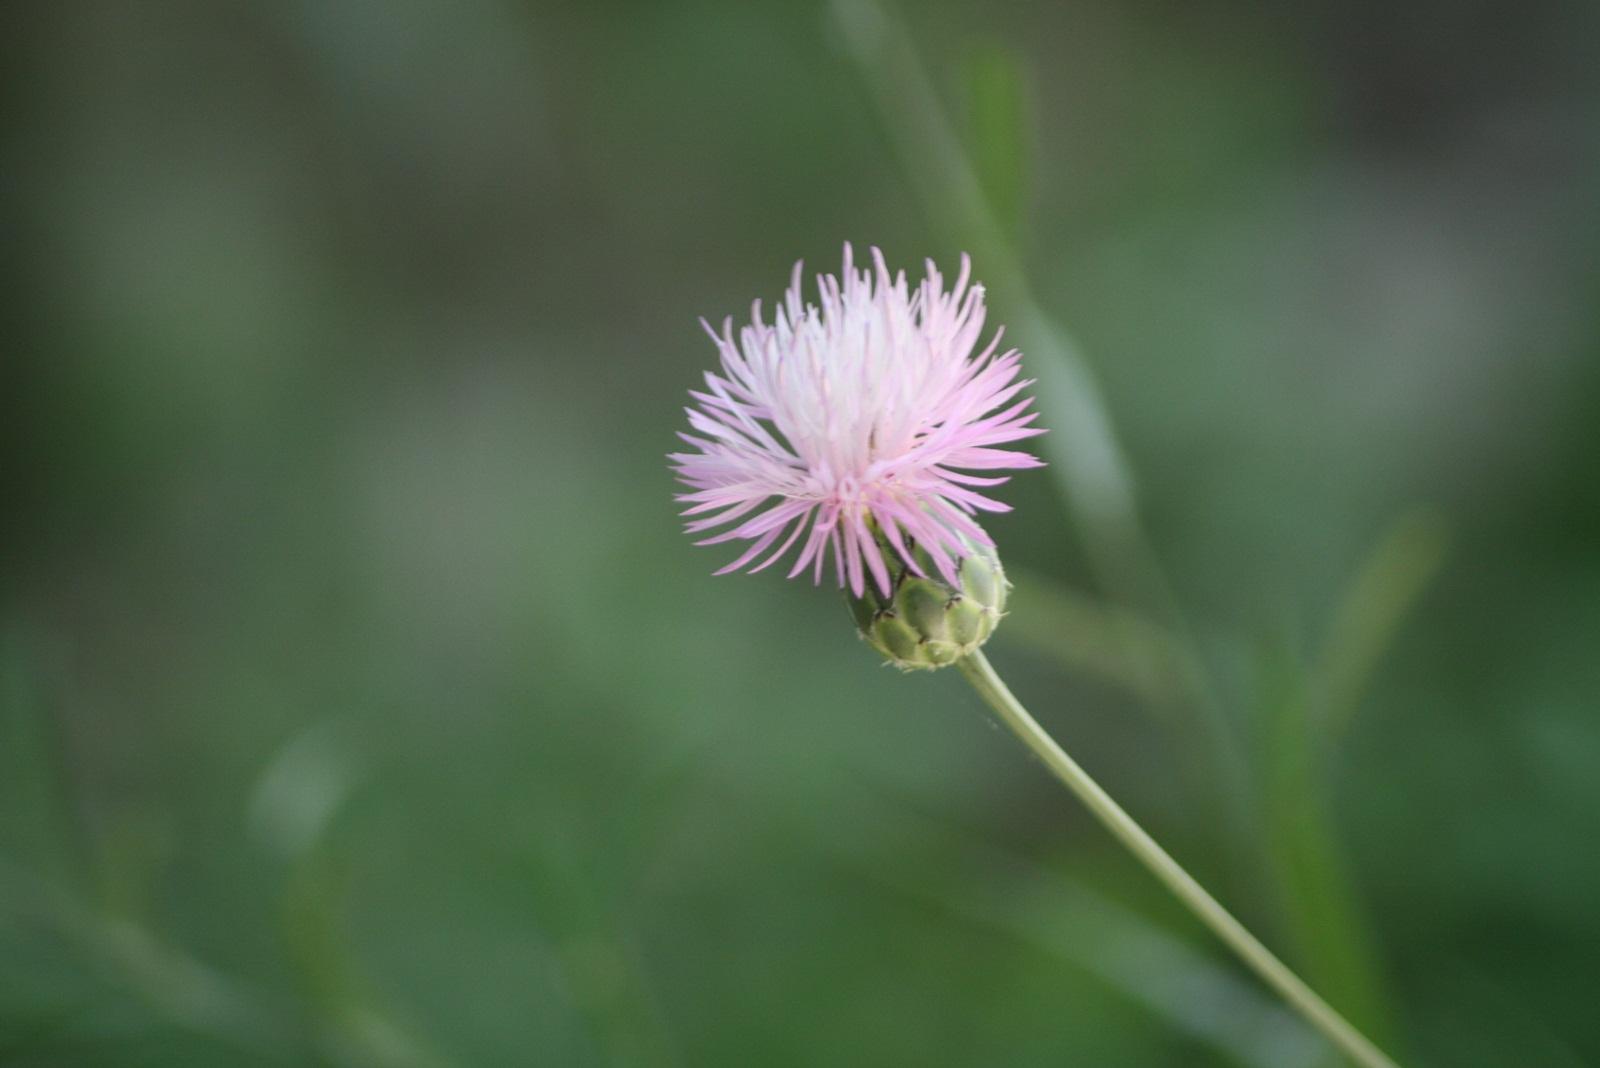 De color lila